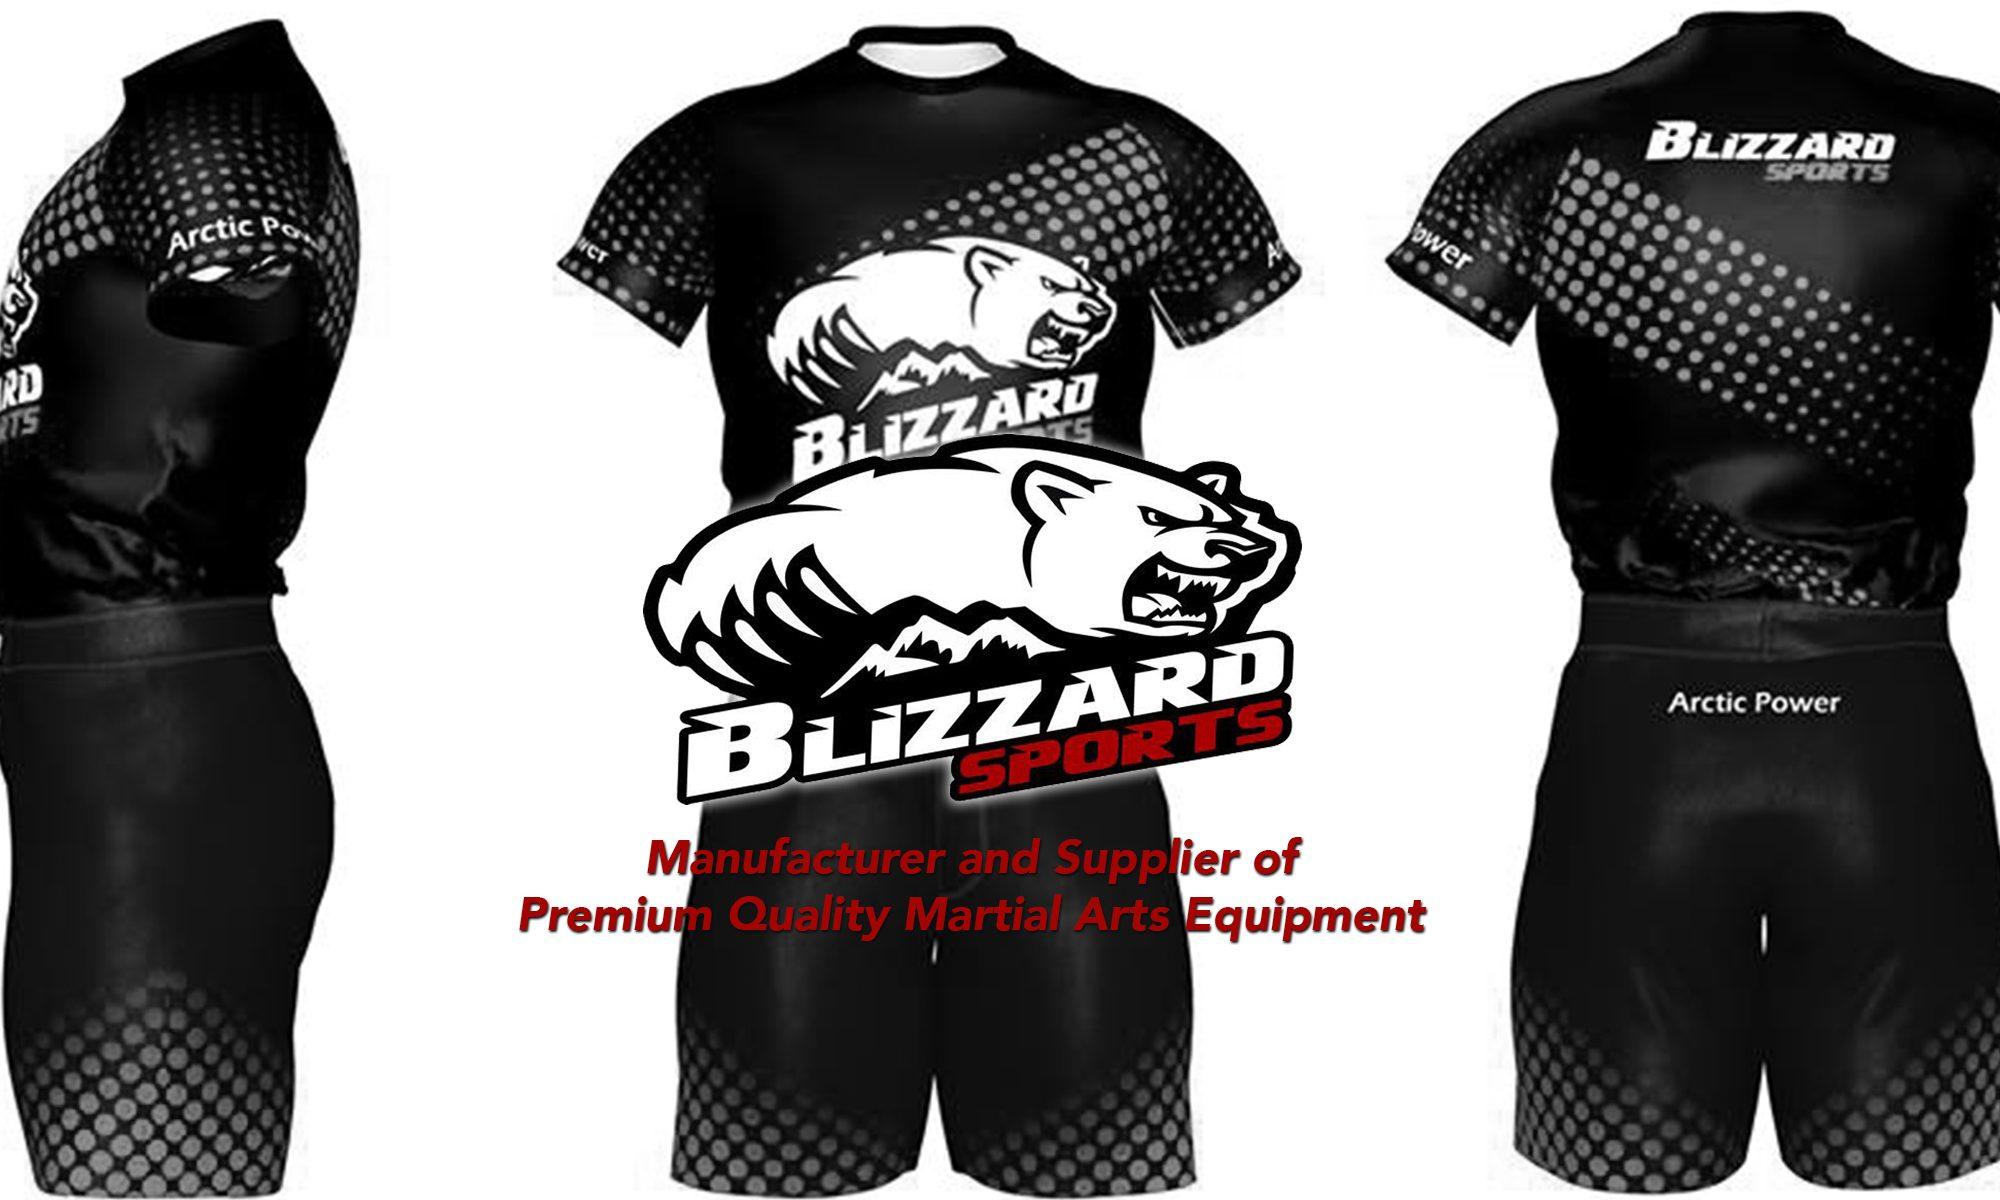 Blizzard Sports